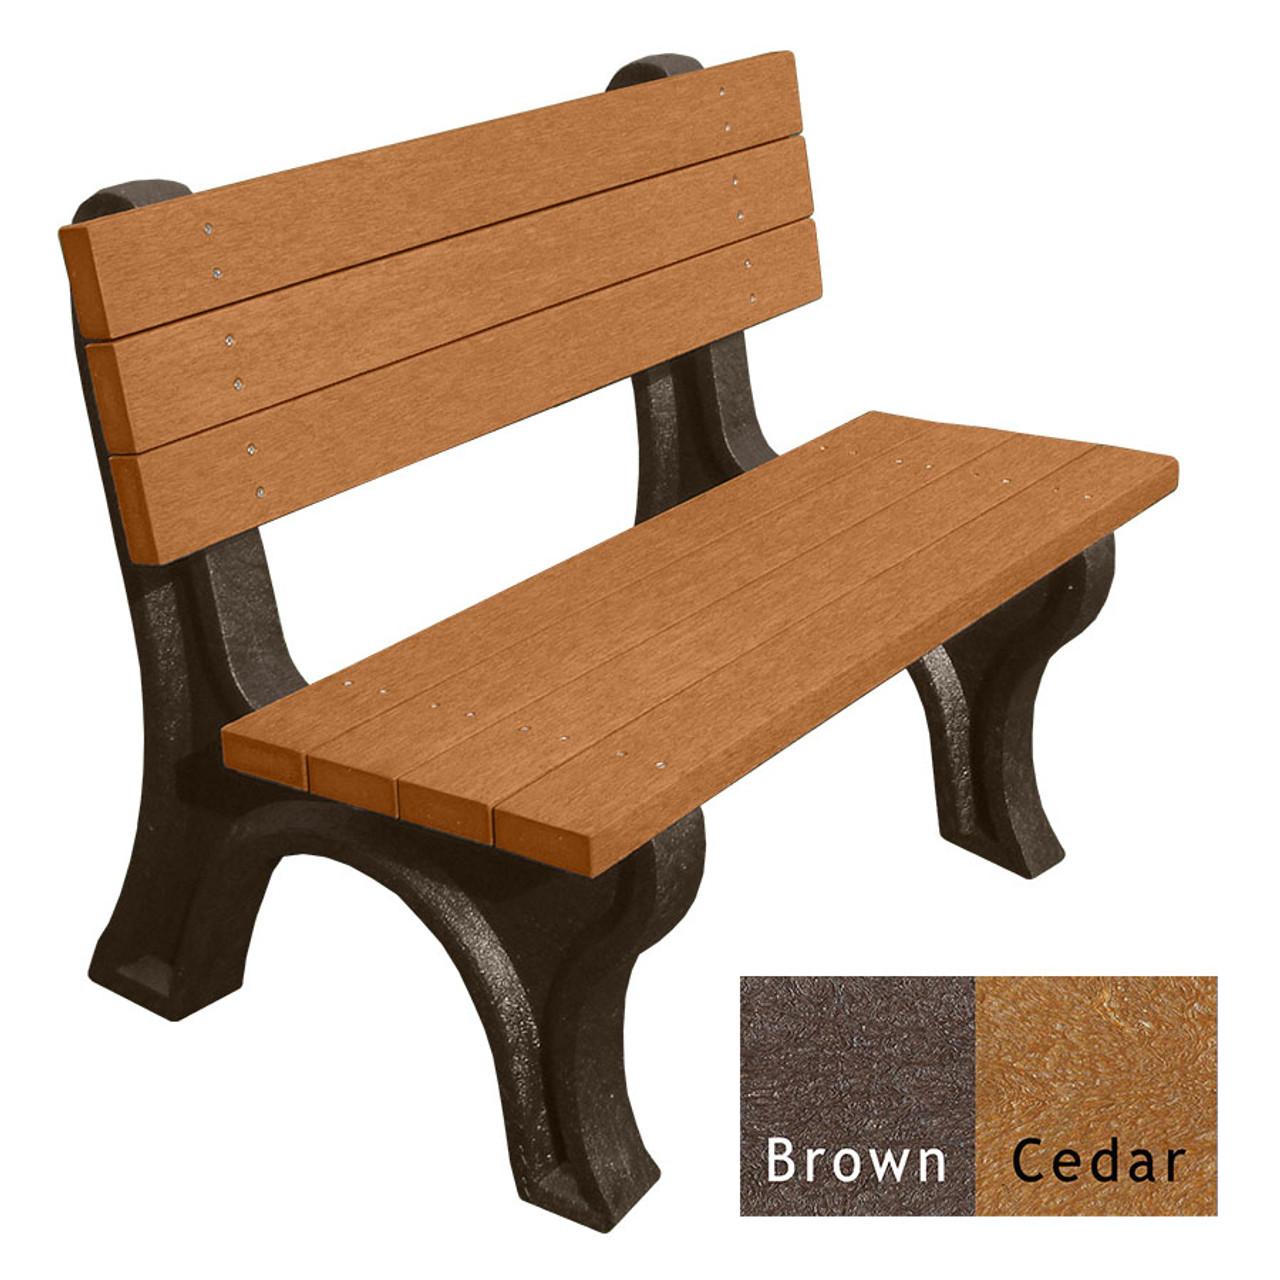 Brown and Cedar